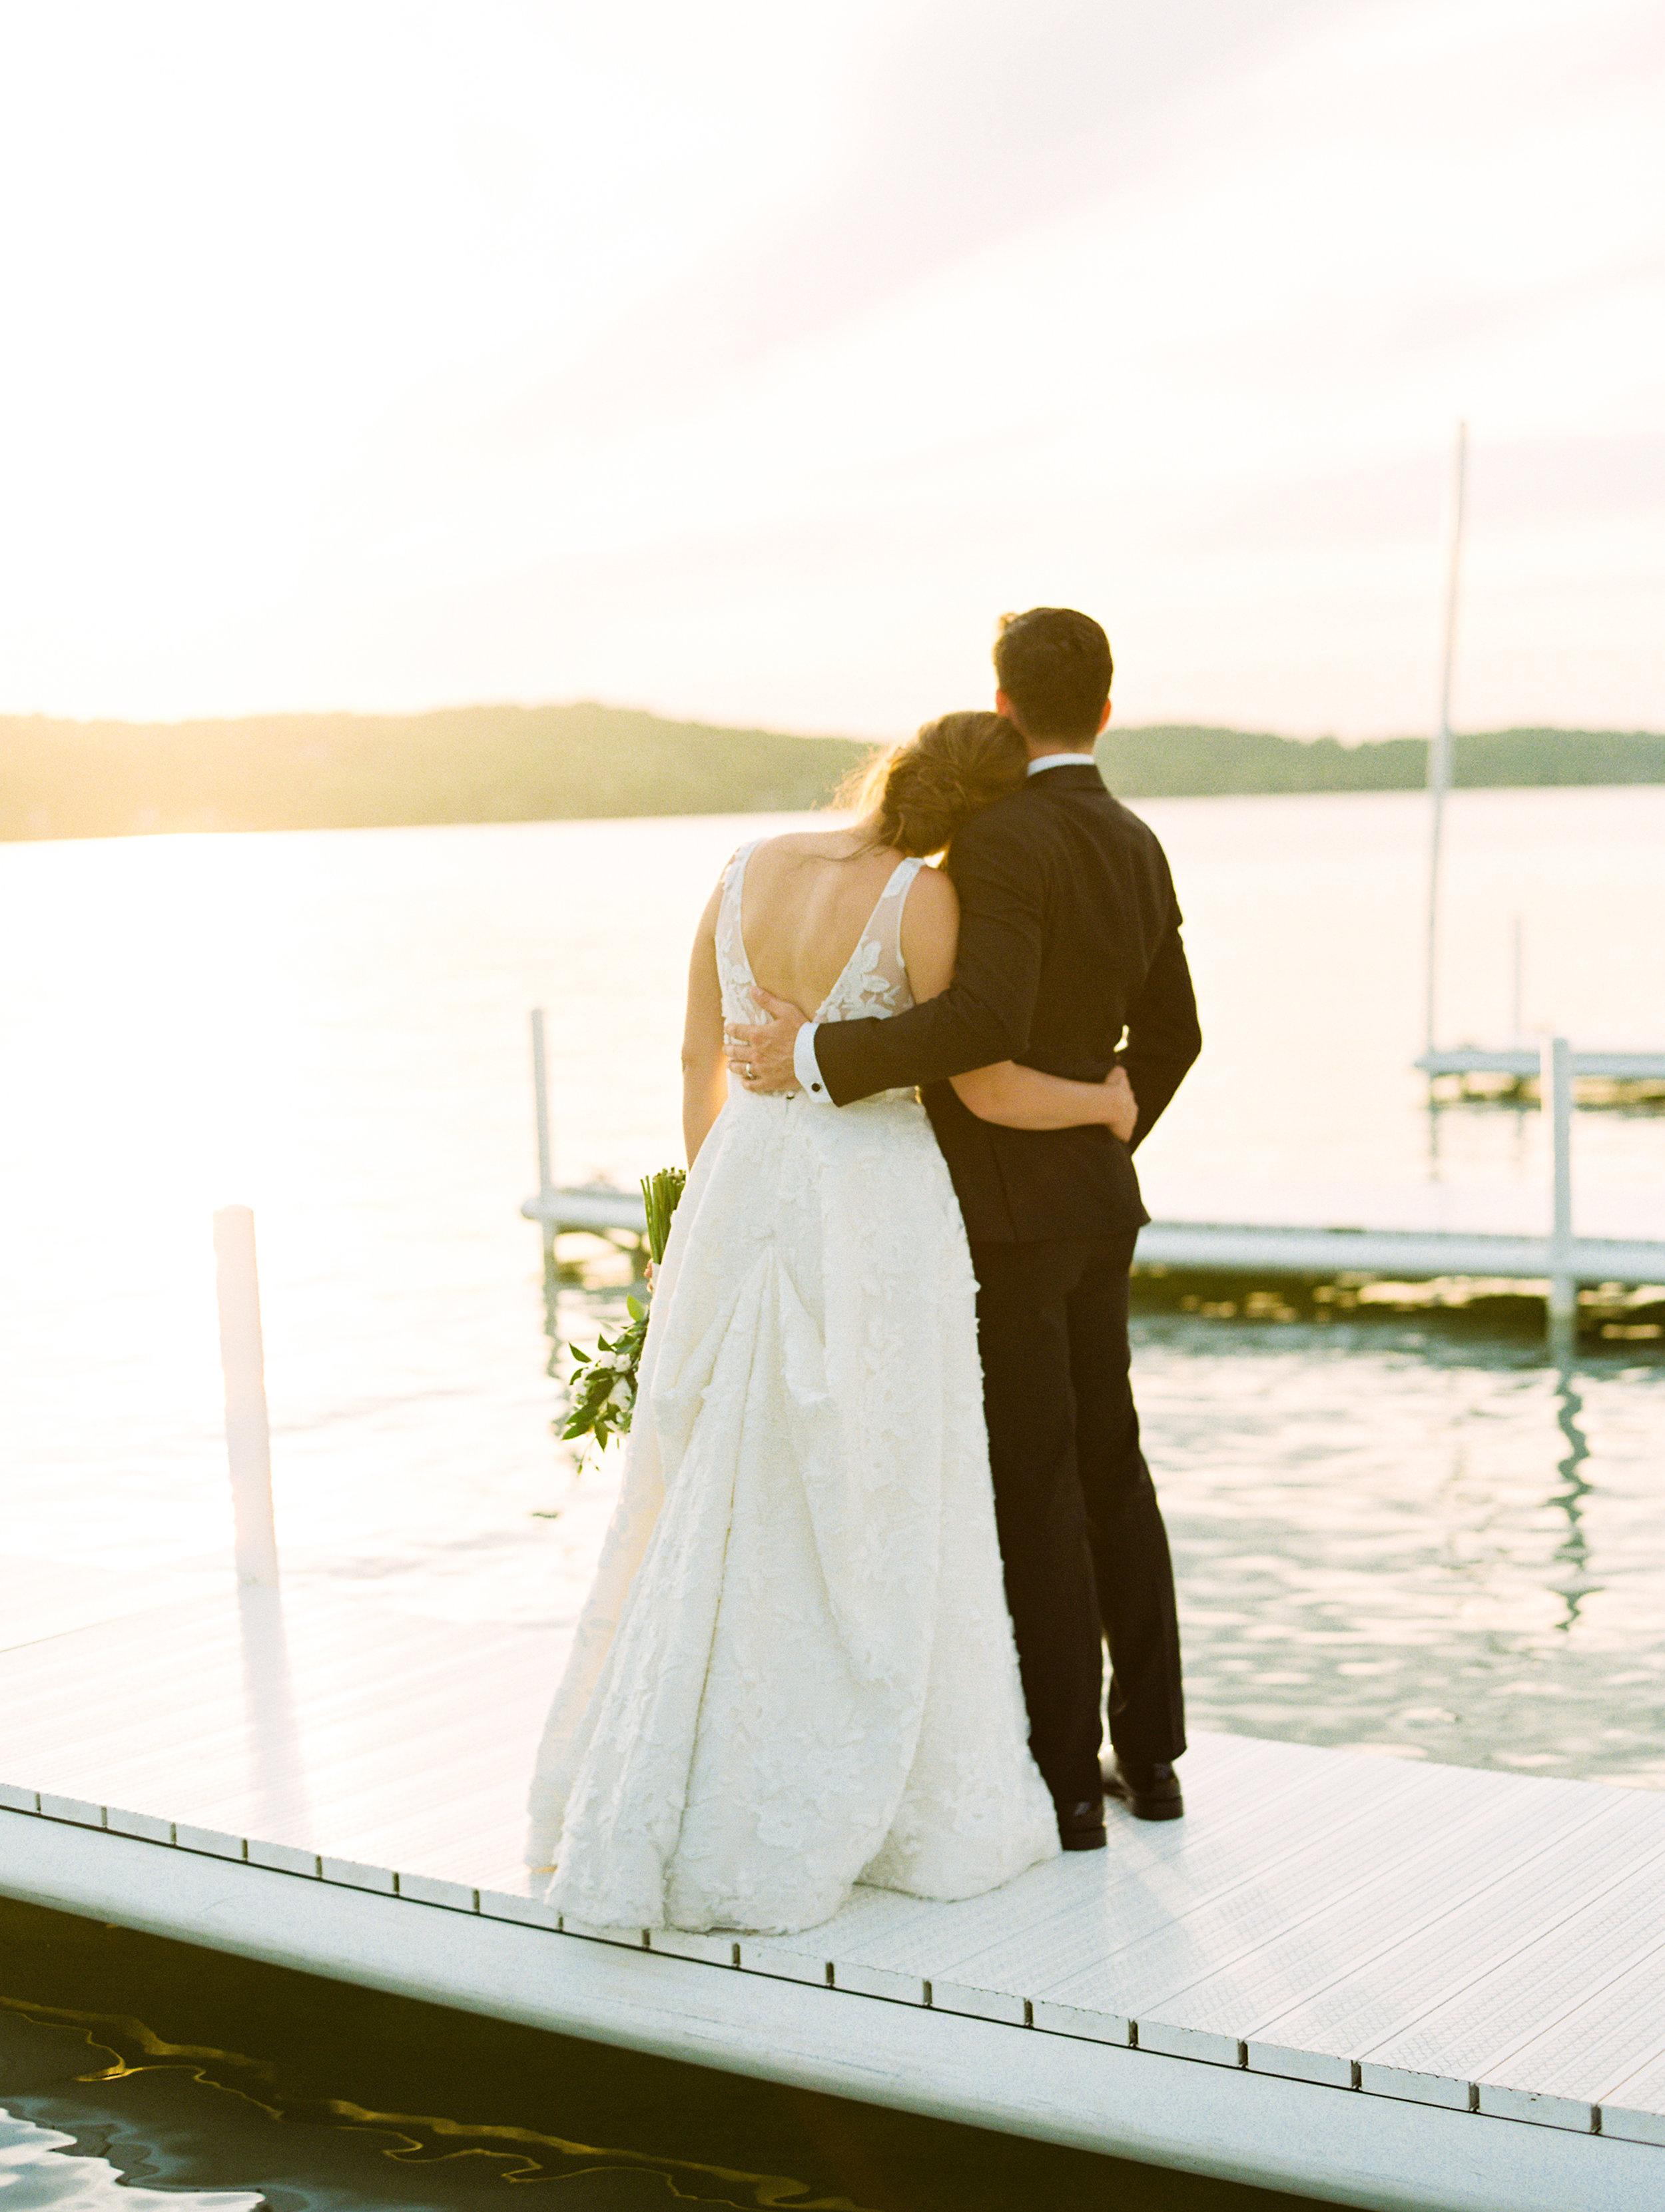 DeGuilio+Wedding+BrideGroomSunsetf-22.jpg